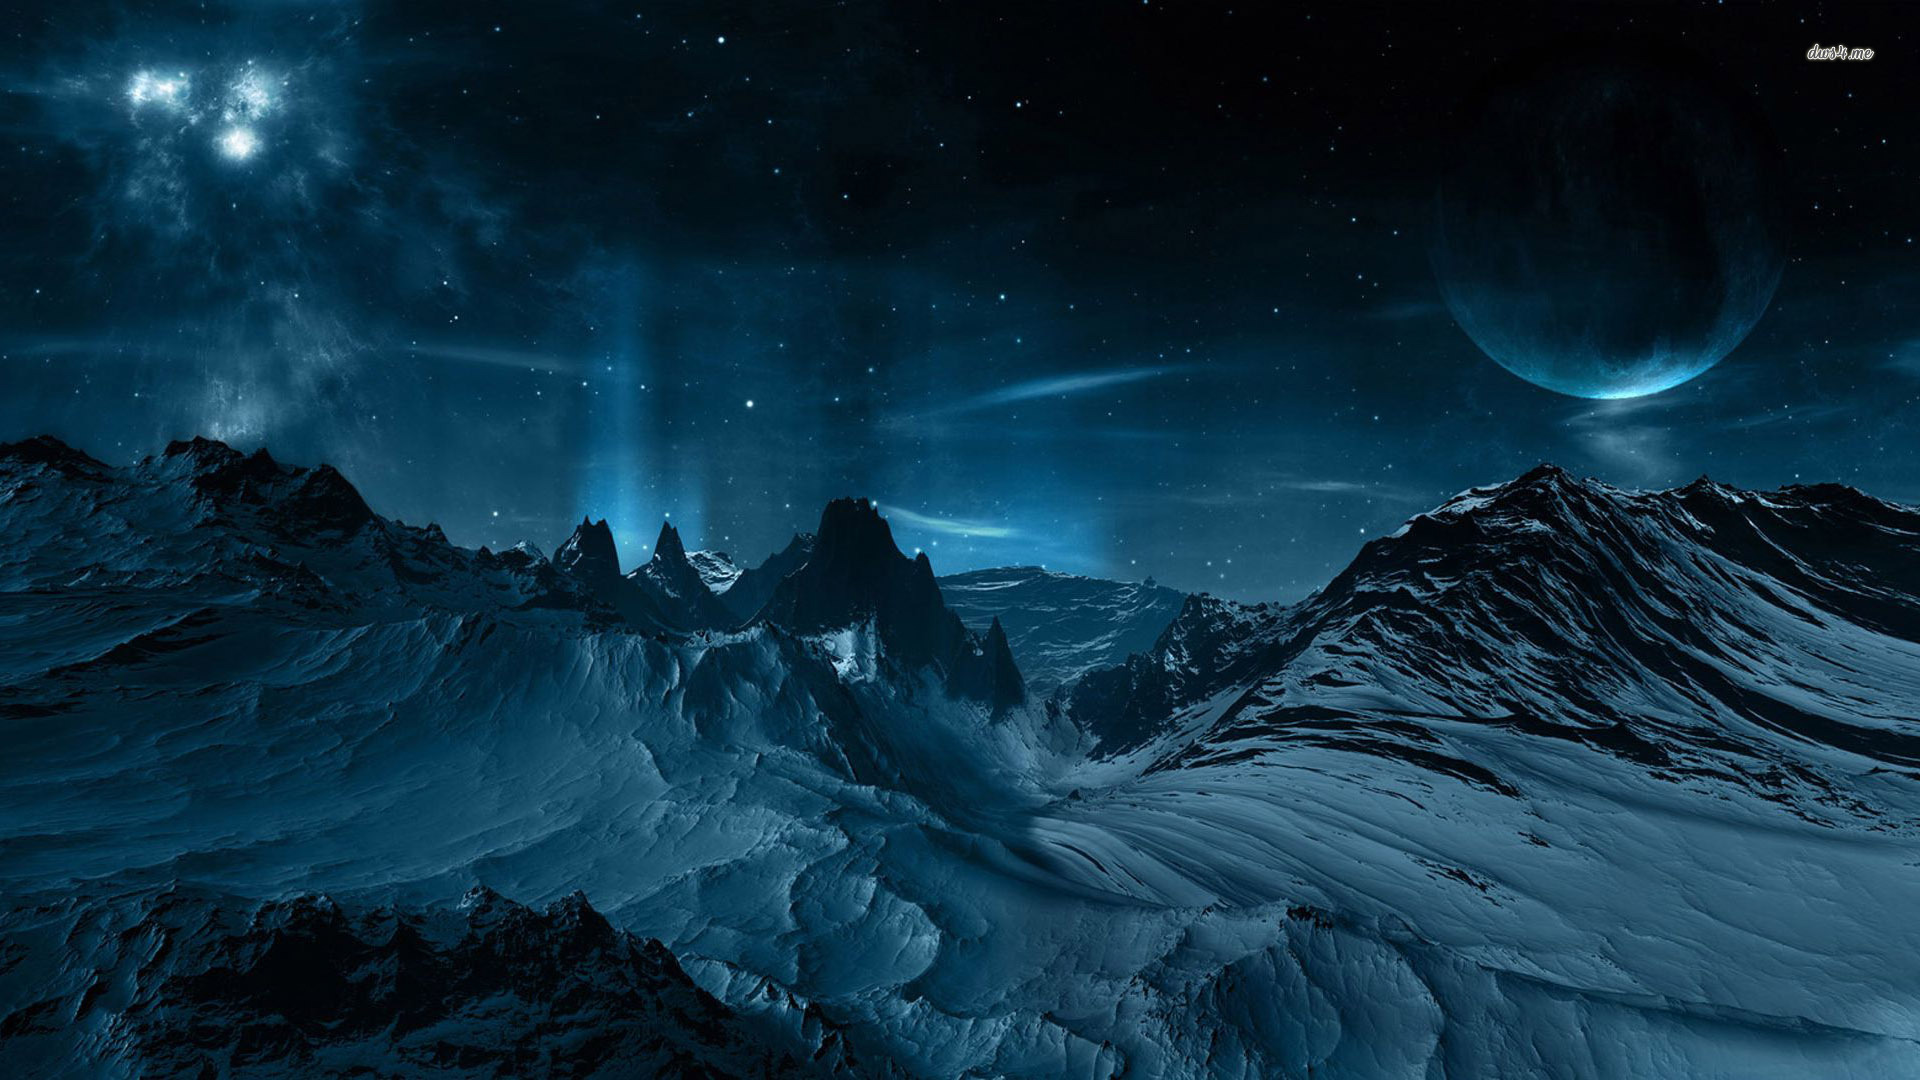 Night Sky HD wallpapers 1920x1080